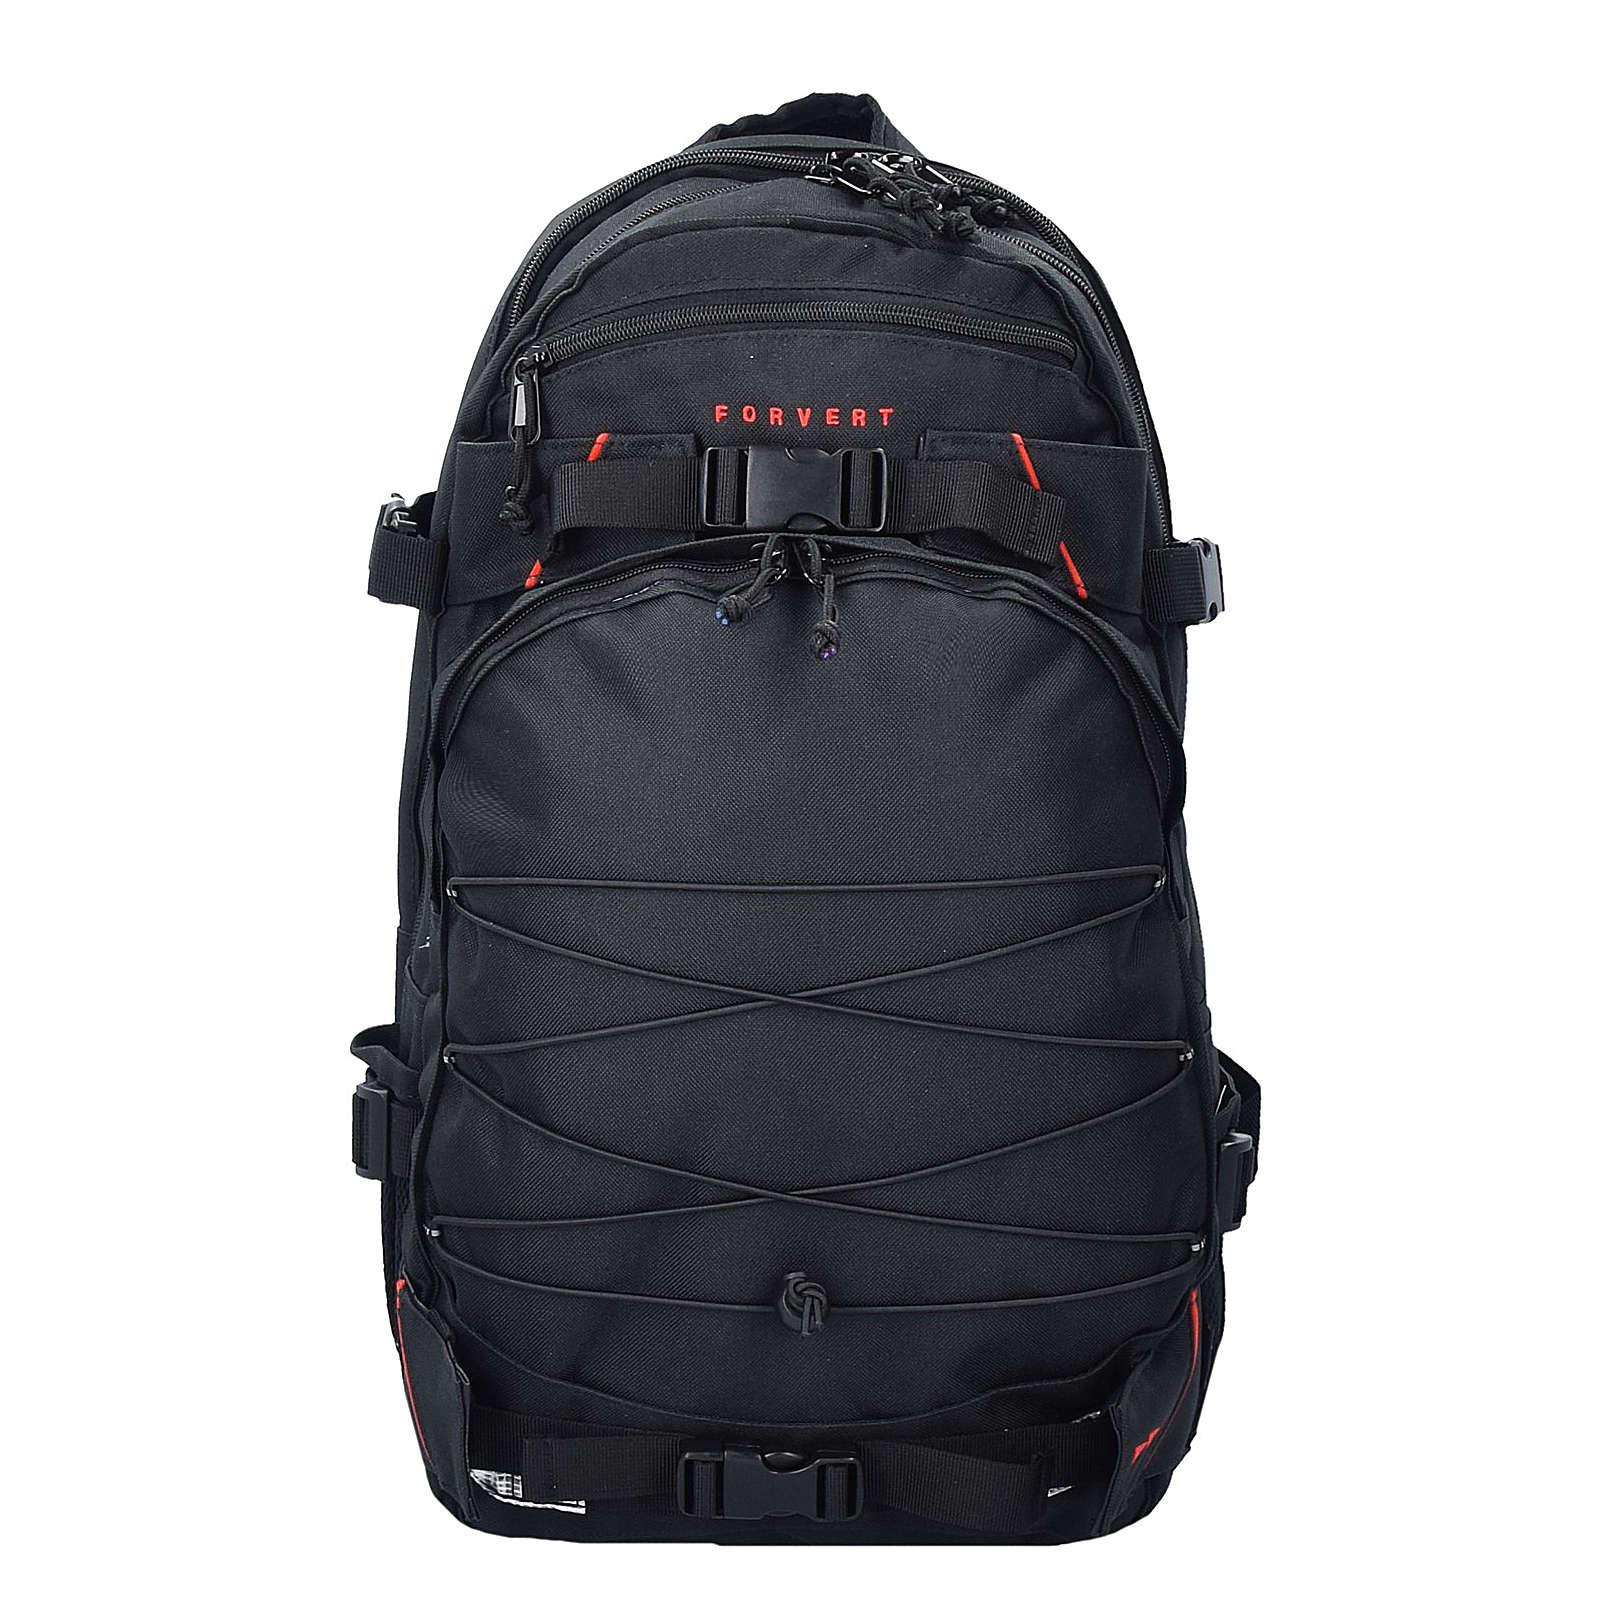 Forvert Backpack Laptop Louis Rucksäcke schwarz